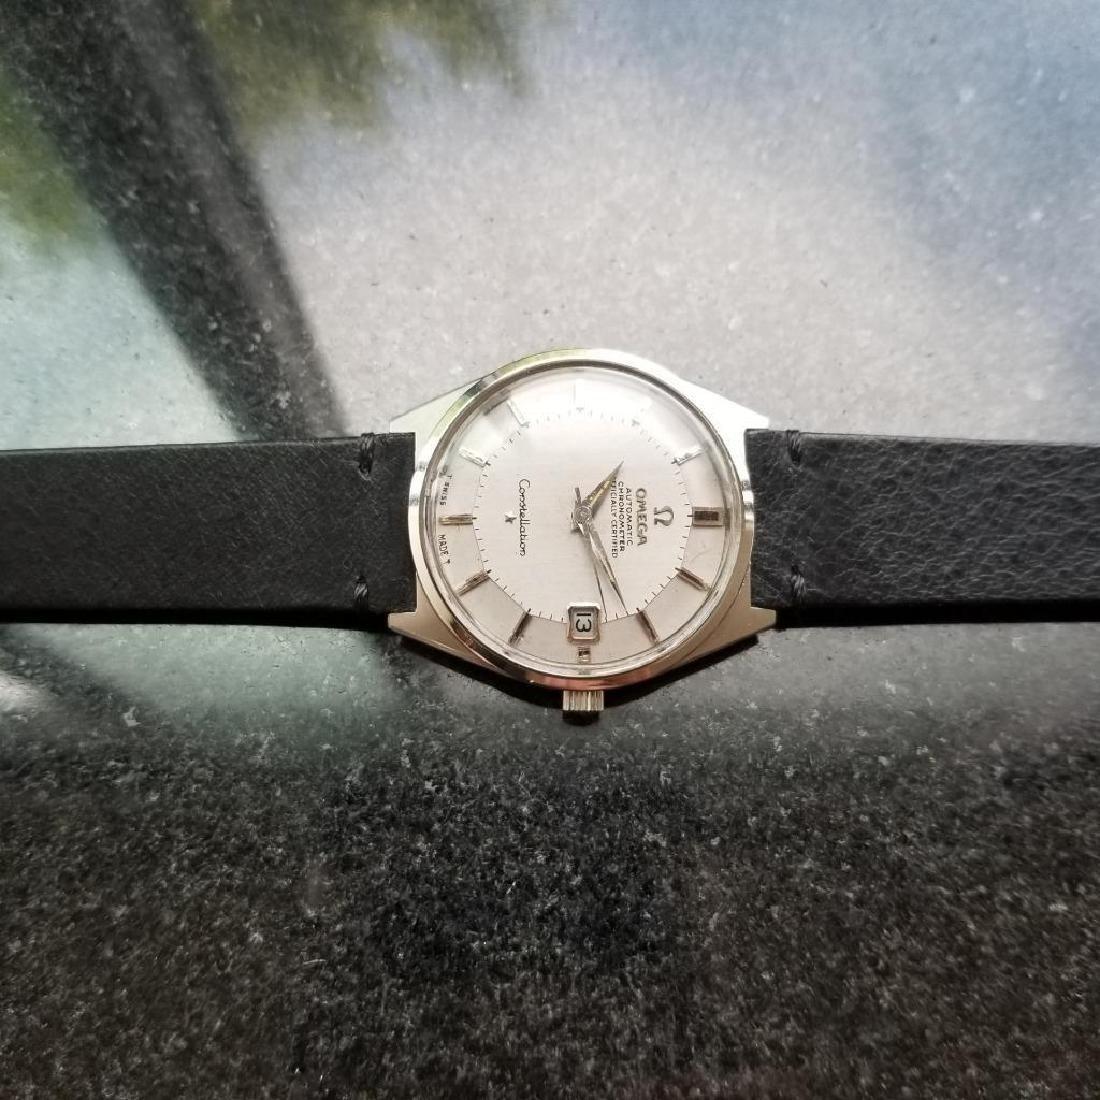 Omega Vintage 1968 Constellation Piepan Rare Automatic - 5